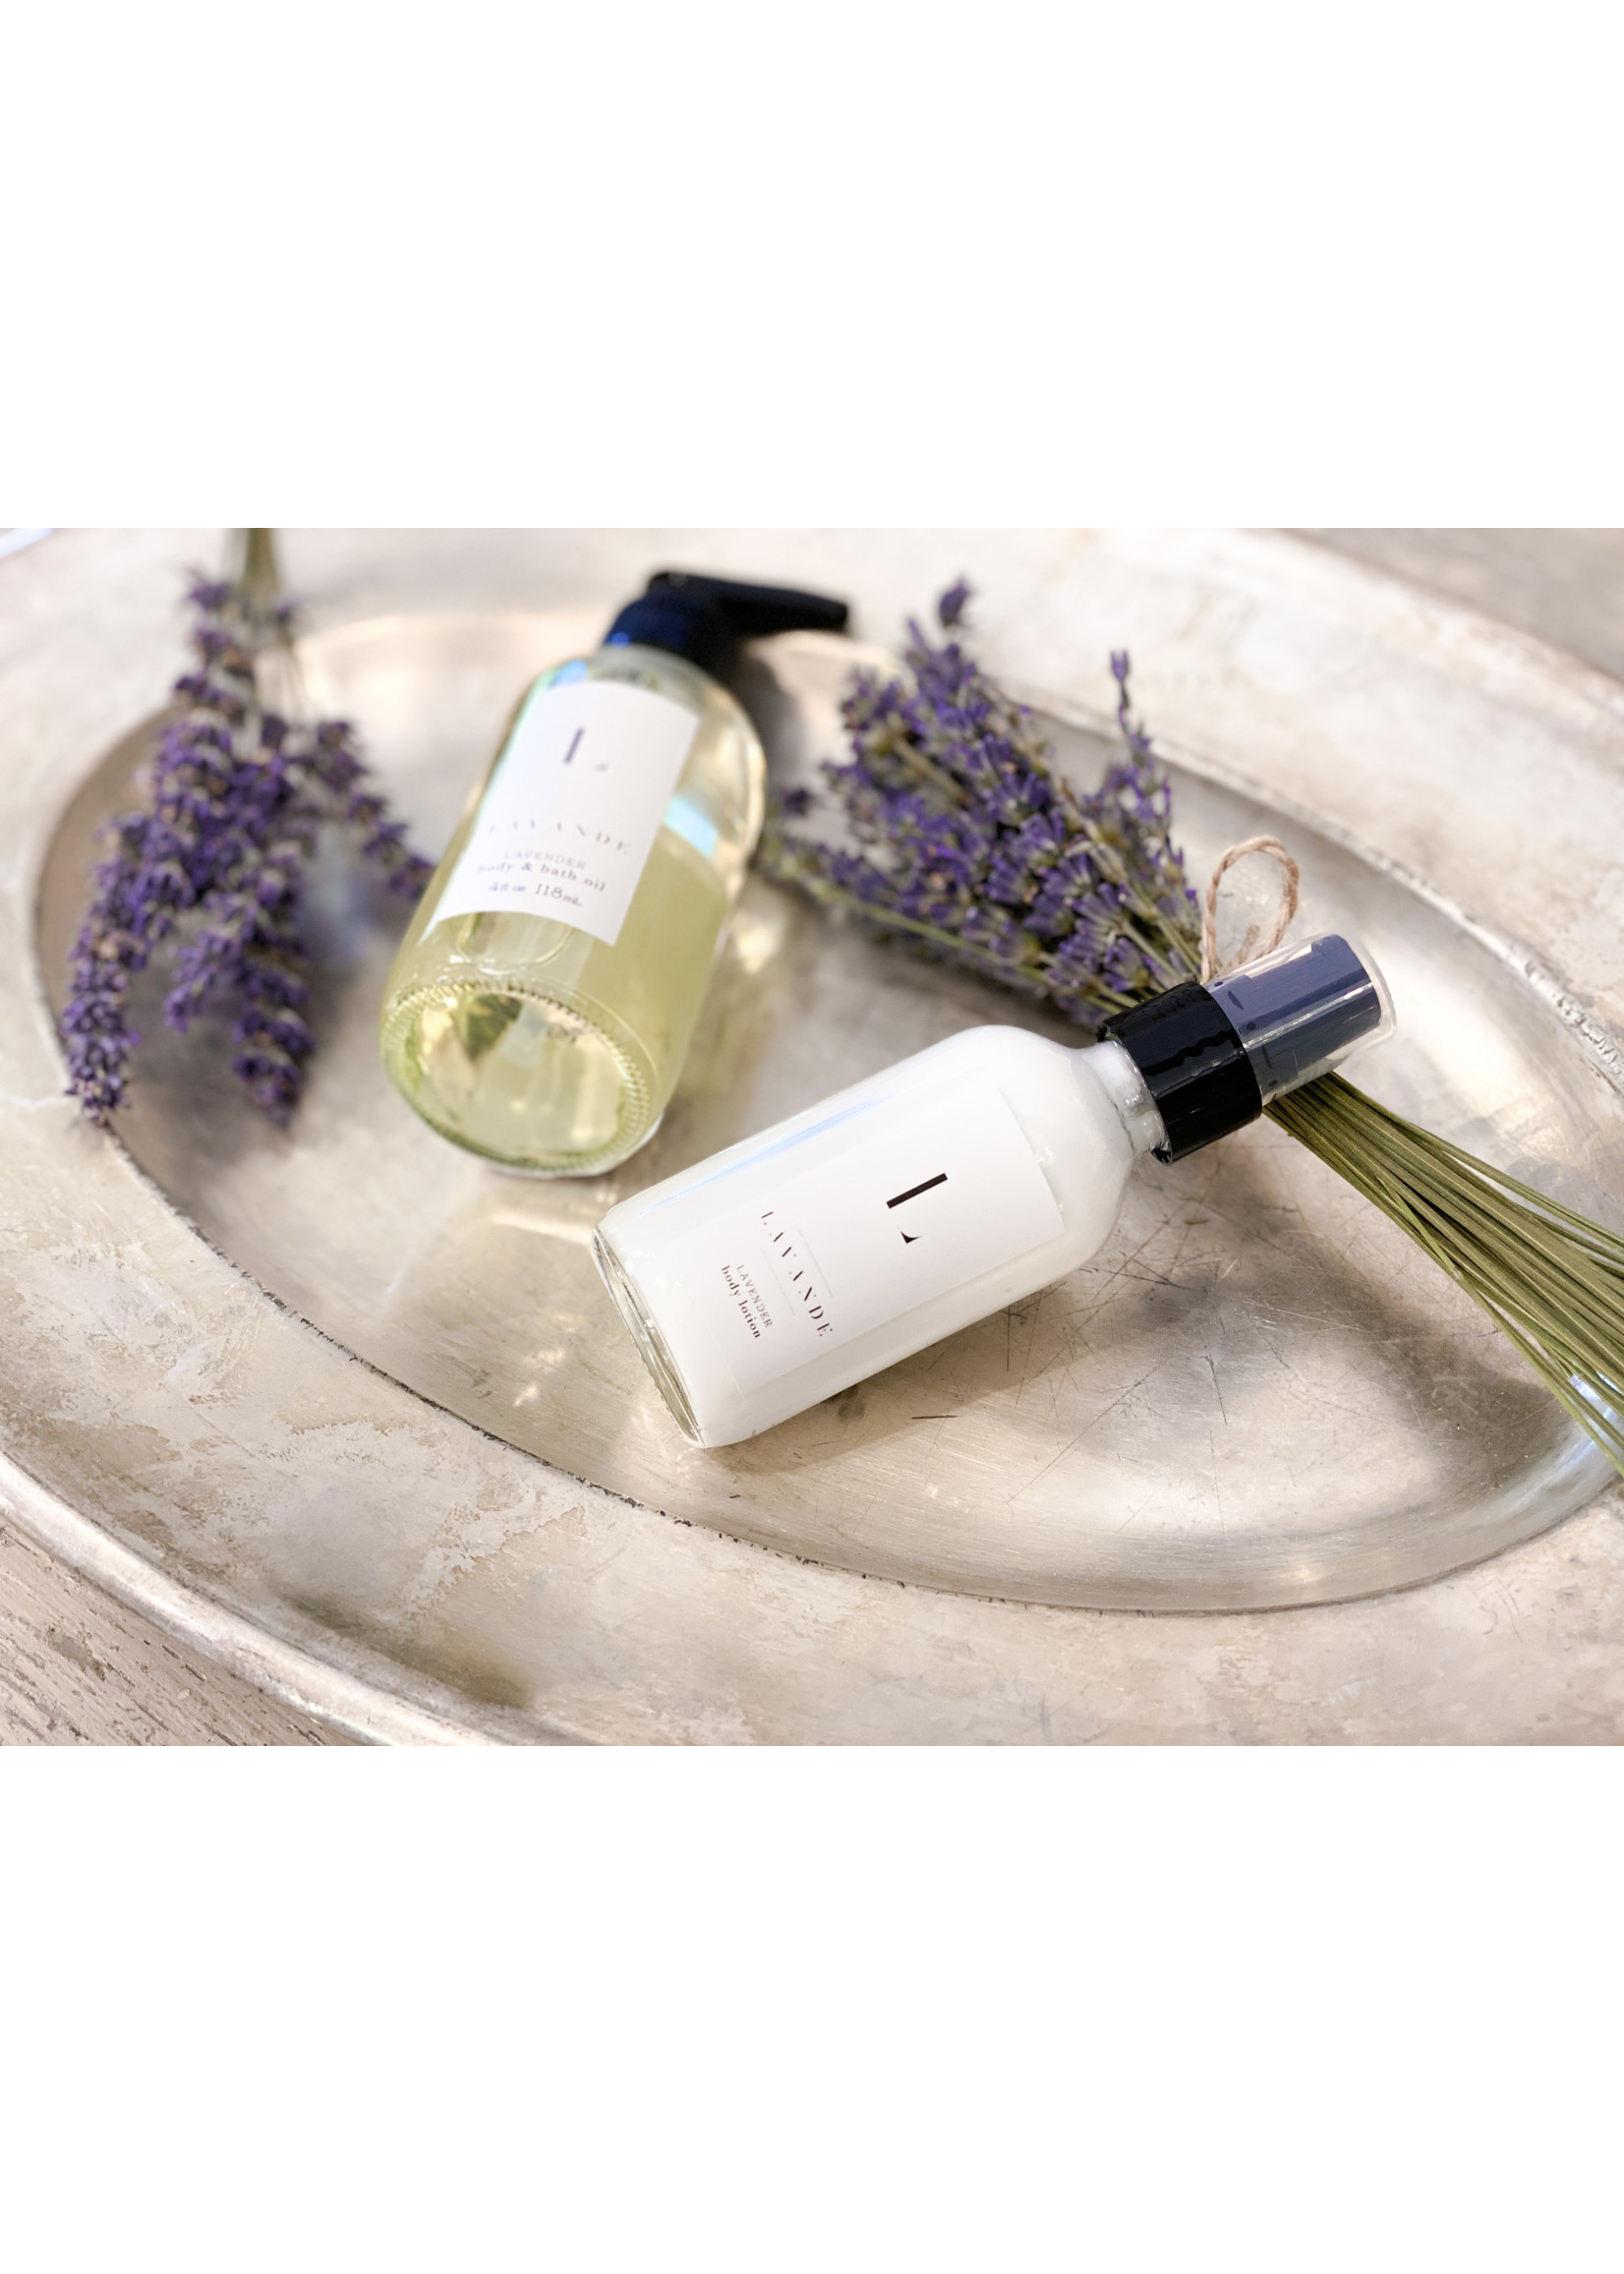 Lavande Farm Lavender Lotion - 2 oz